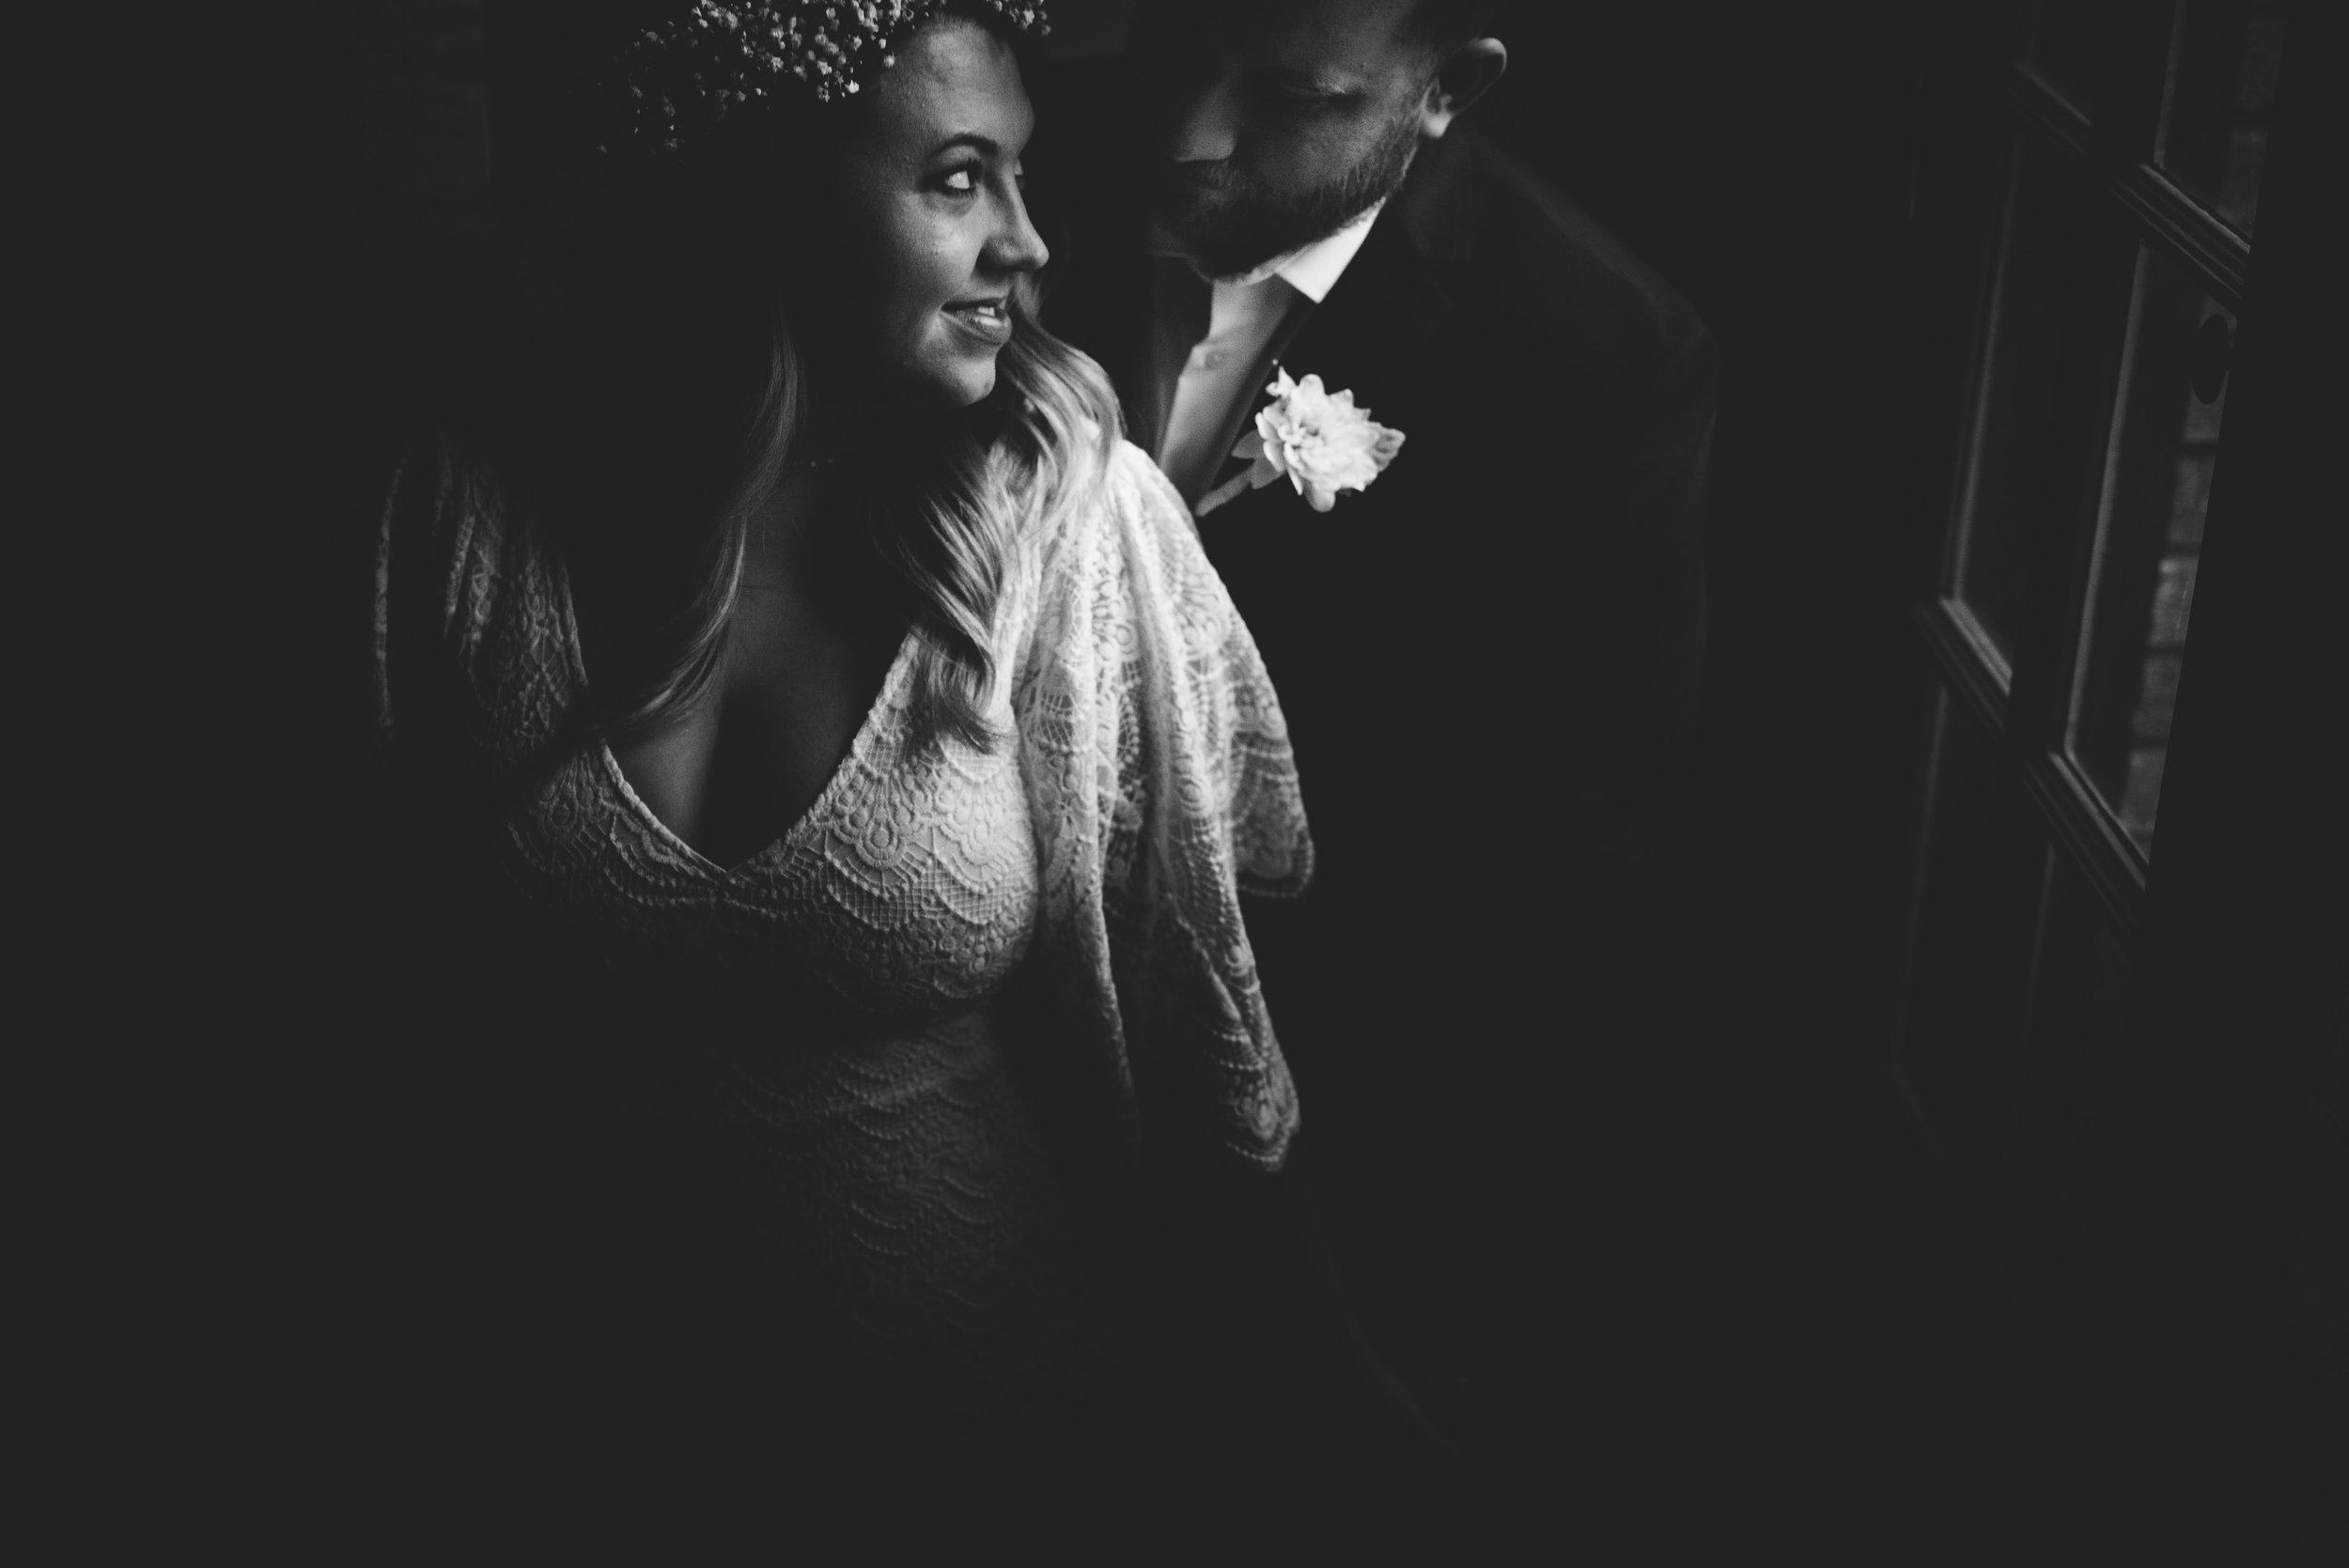 2-star_wedding-bethany-josh-8.jpg